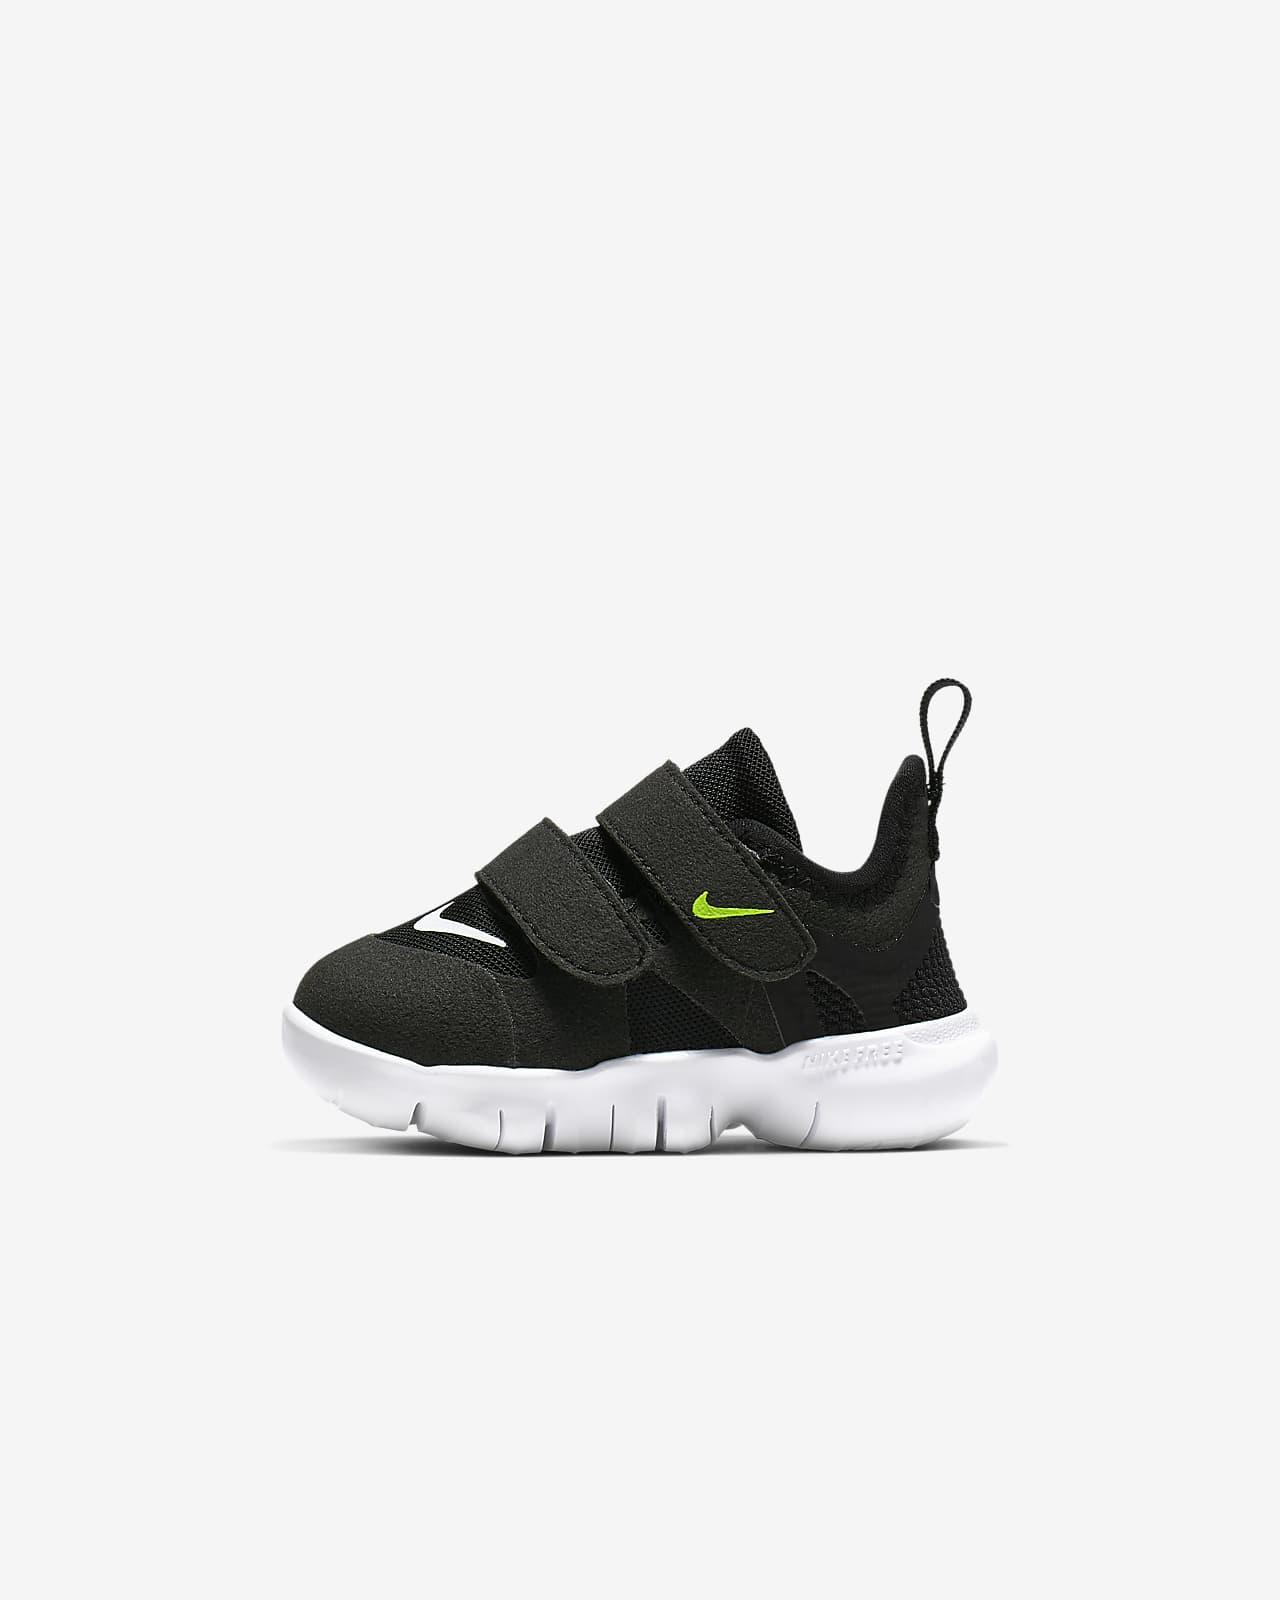 Nike Free RN 5.0 Baby and Toddler Shoe